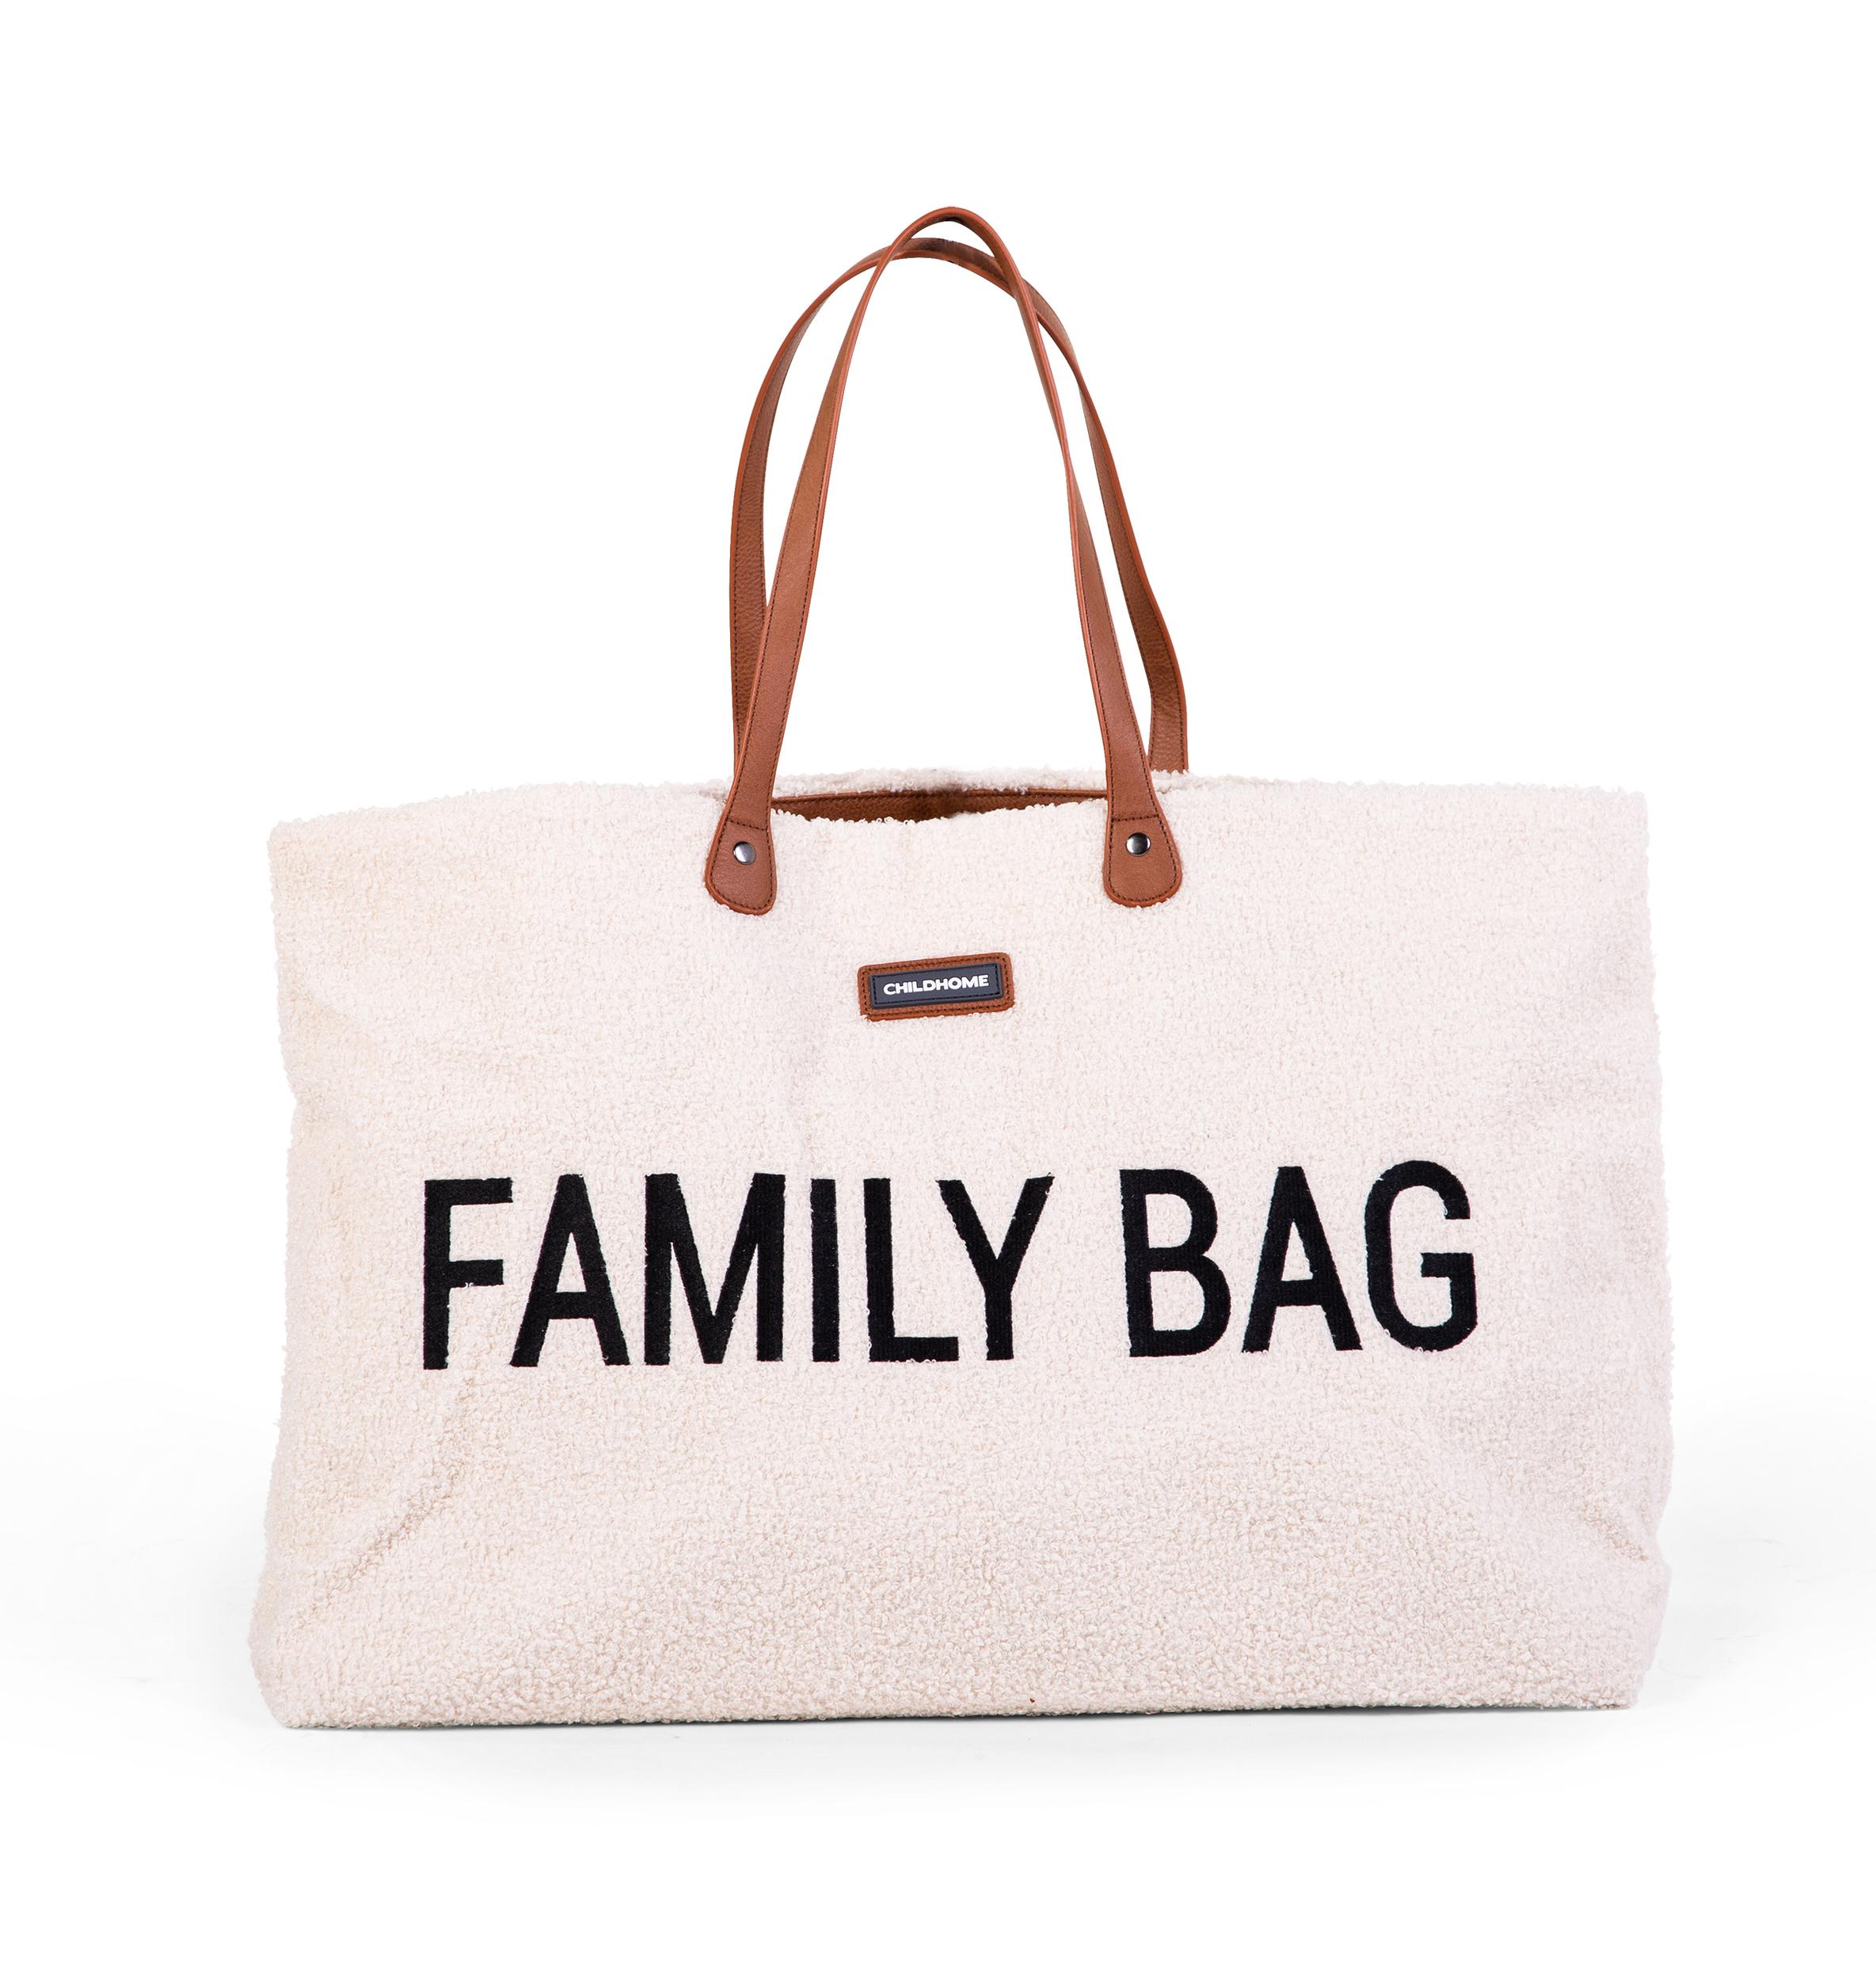 SAC DE VOYAGE - FAMILY BAG TEDDY